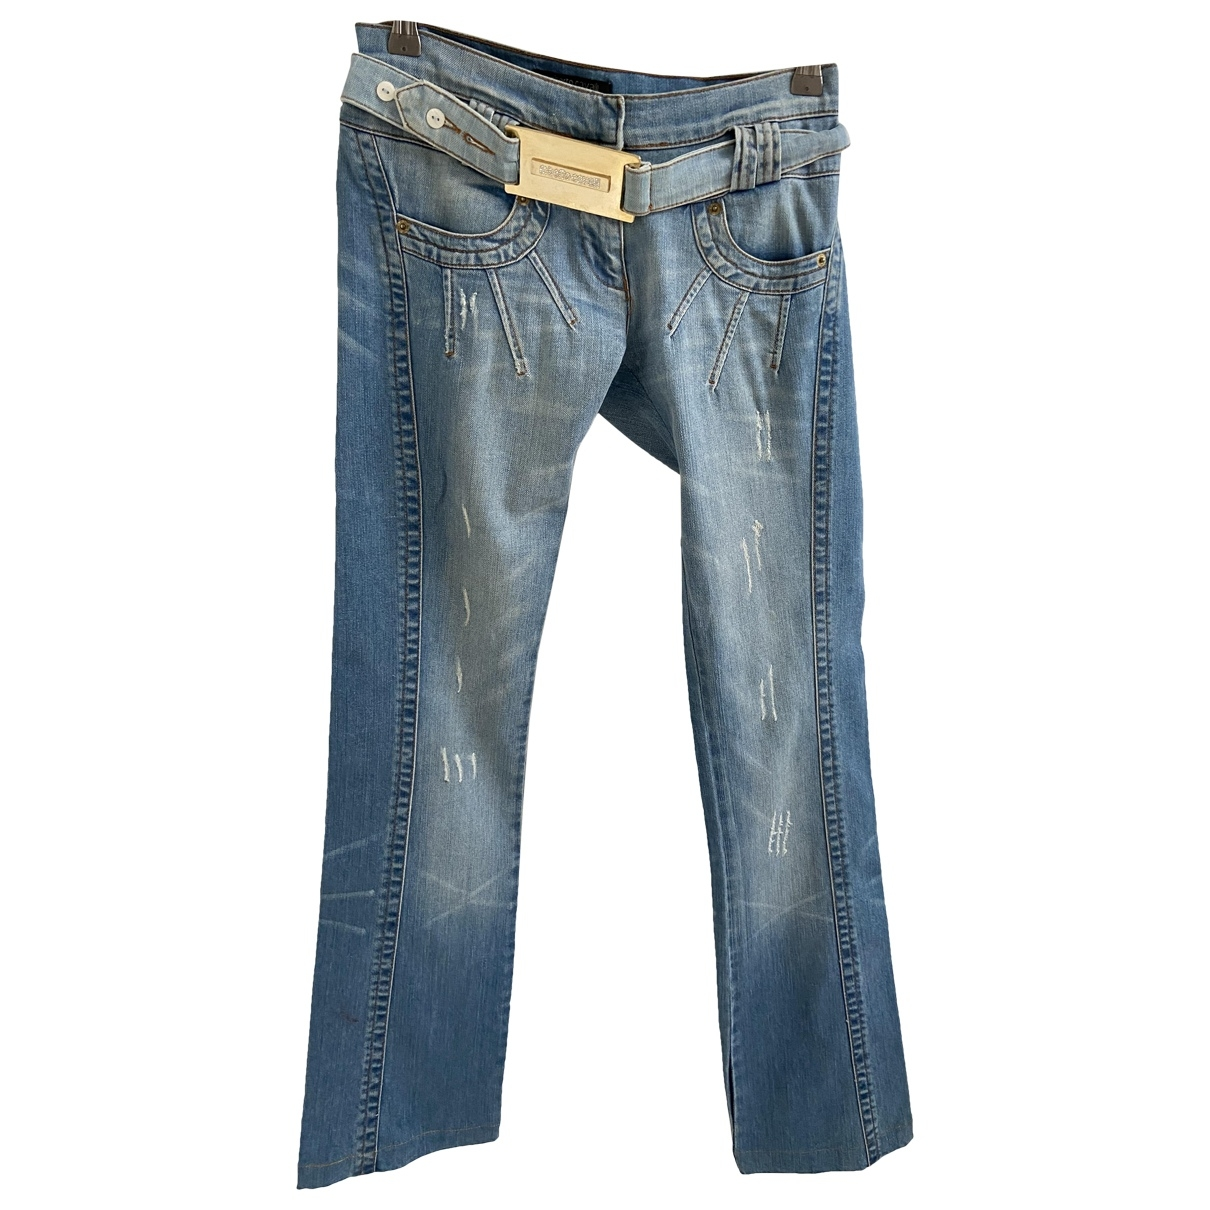 Roberto Cavalli \N Blue Denim - Jeans Trousers for Women 40 IT